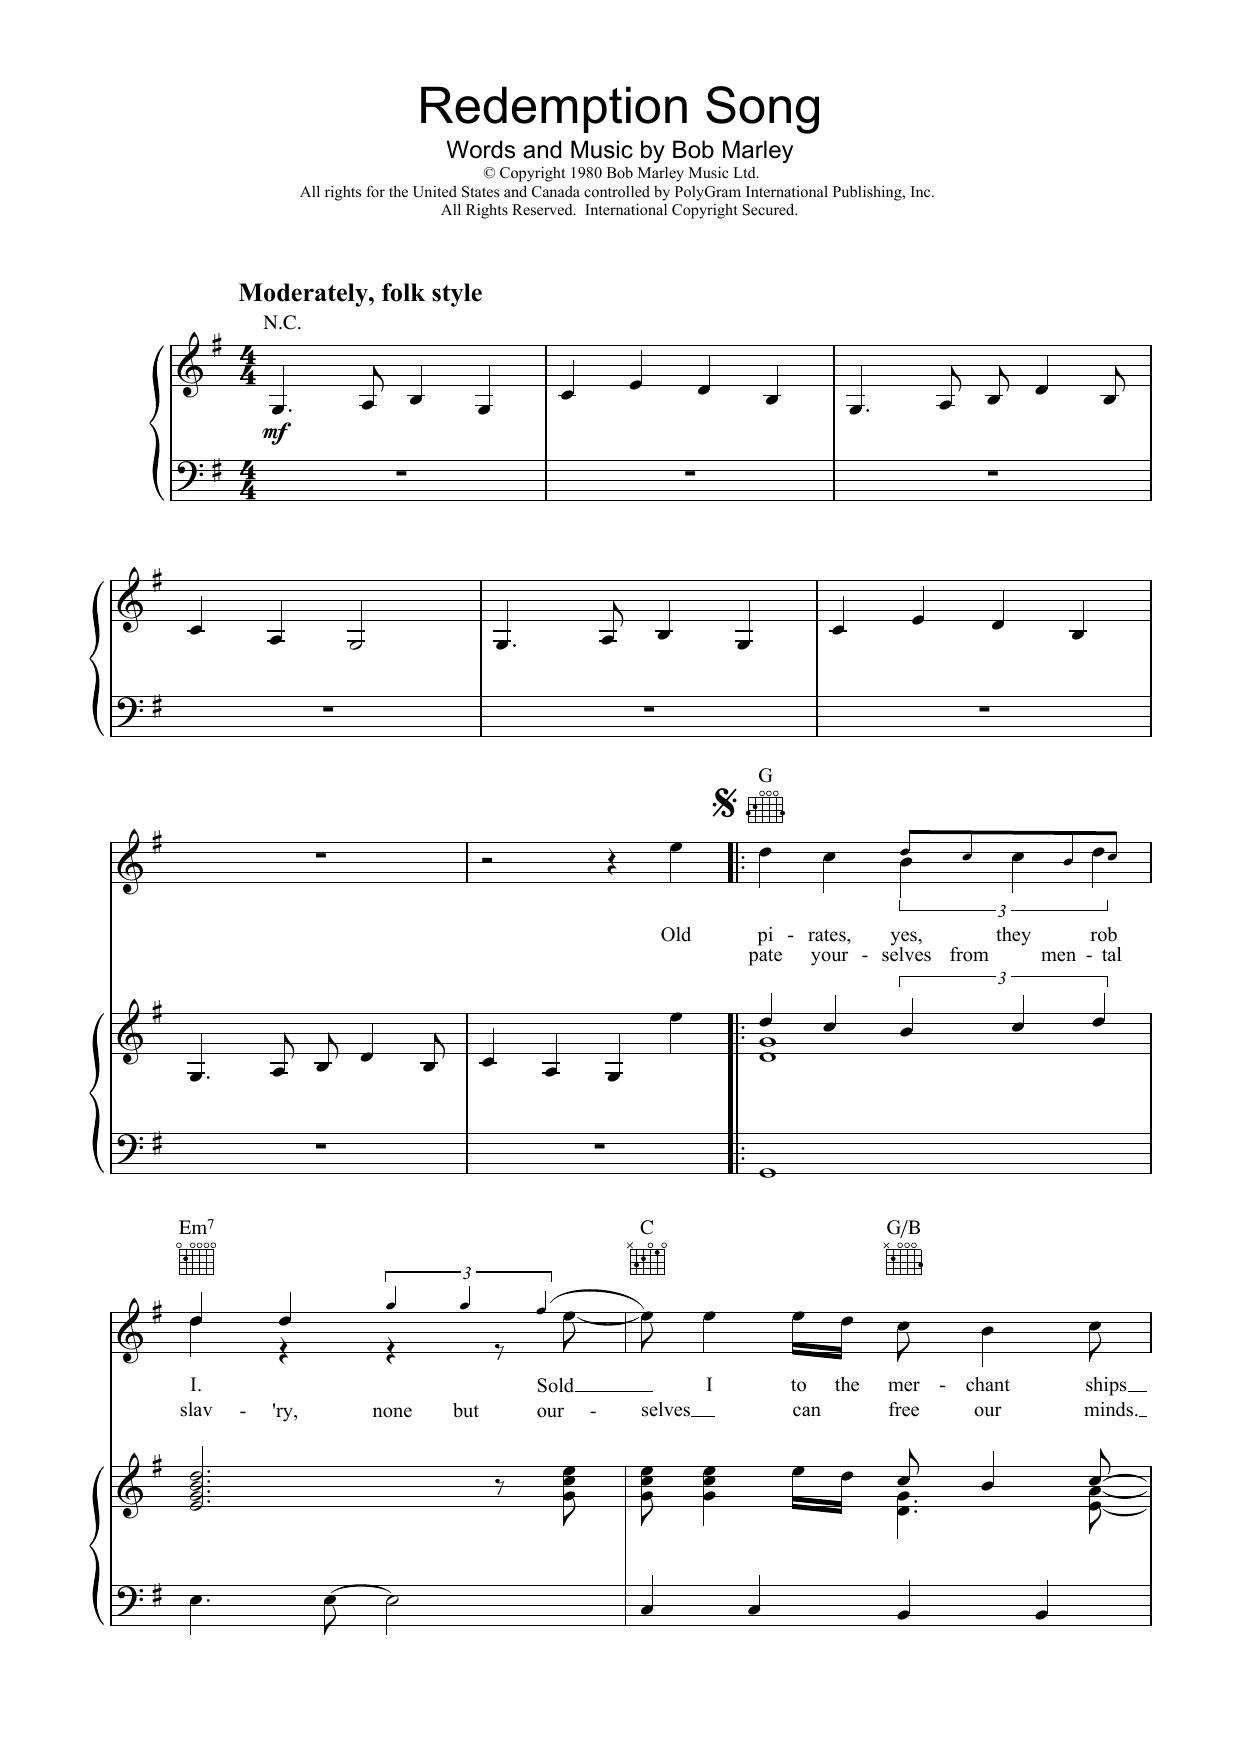 Bob Marley - Redemption Song atStanton's Sheet Music